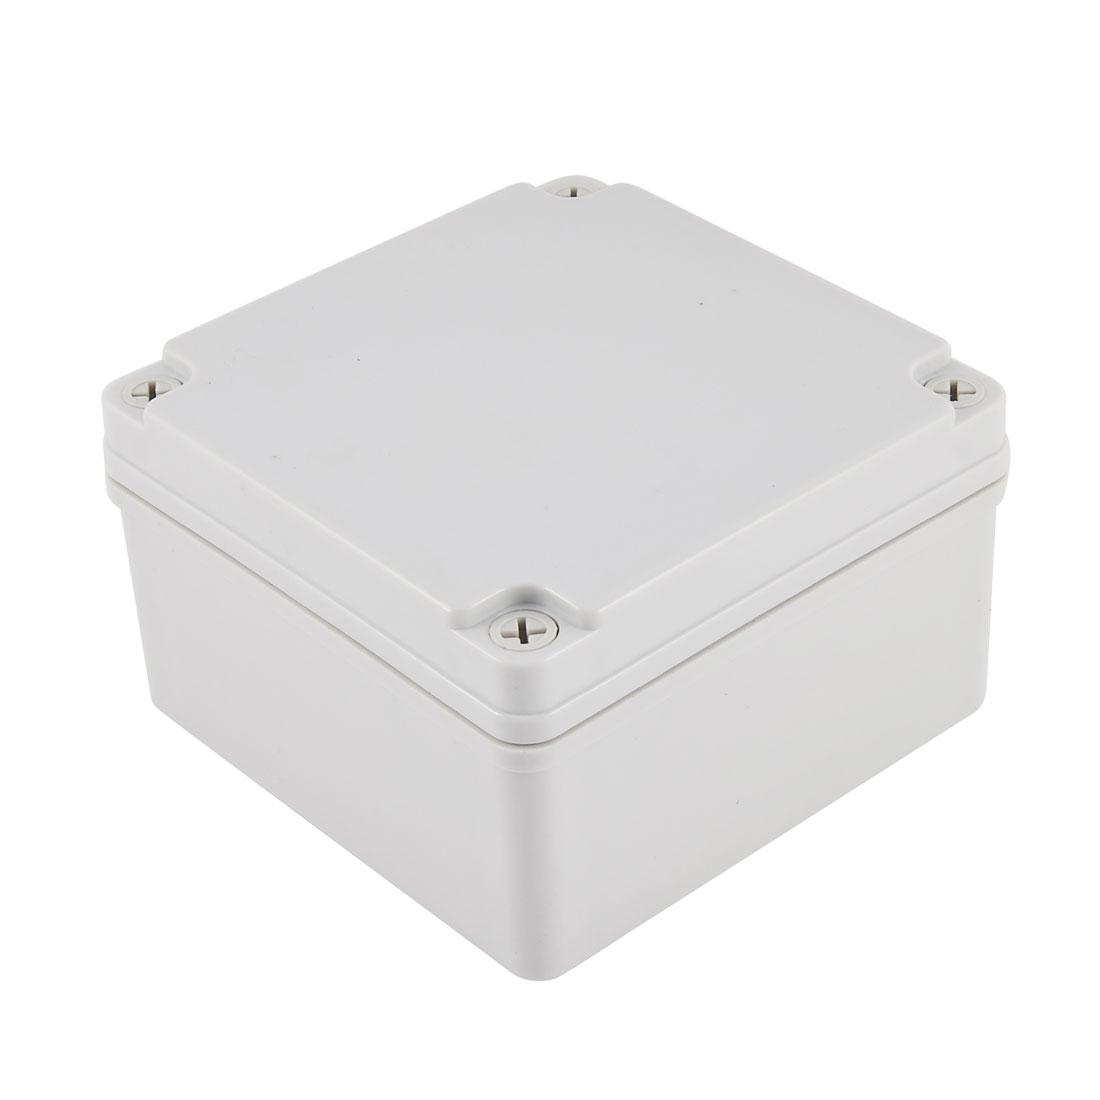 125mm x 125mm x 75mm Waterproof Plastic Sealed Electrical Junction Box Enclosure